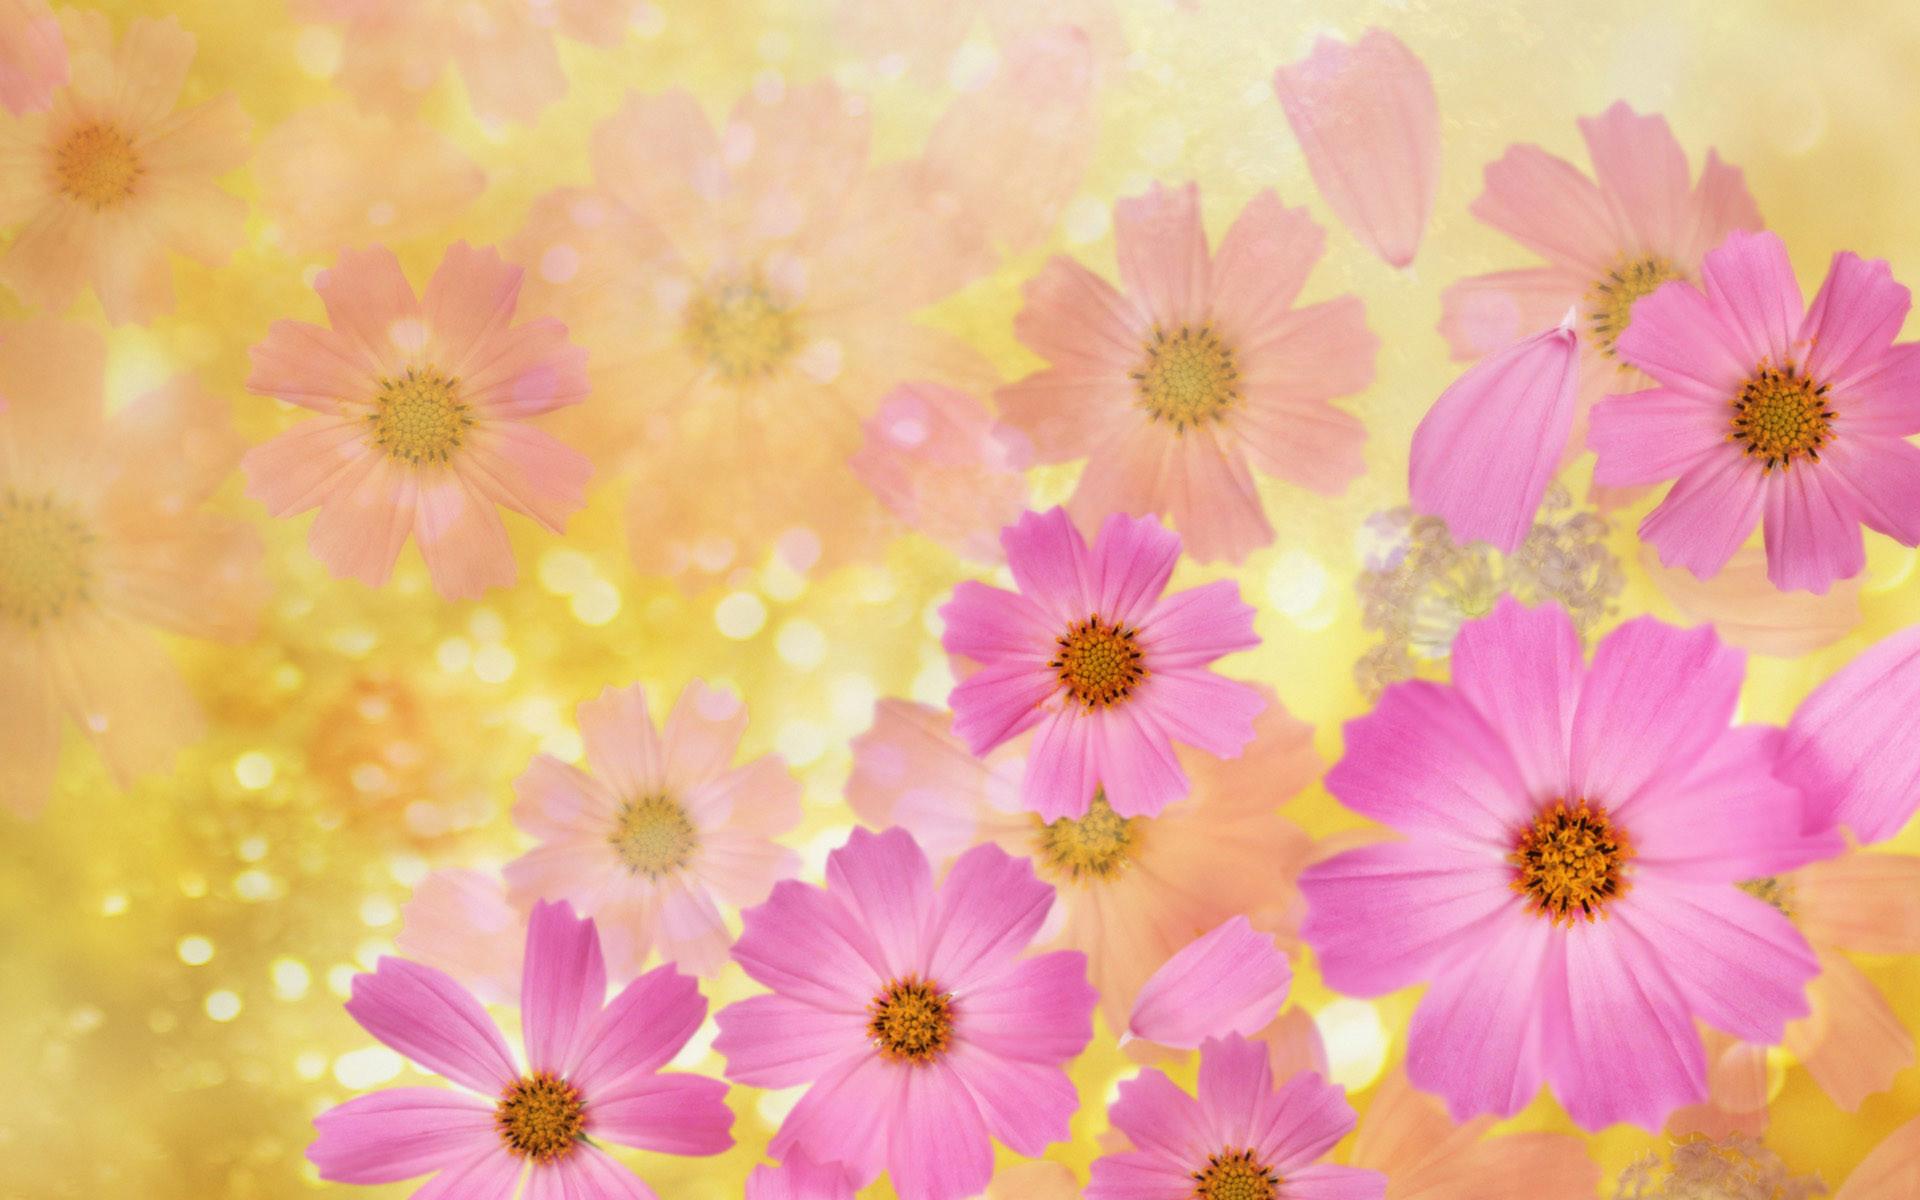 Pink Wallpaper With Cute Puppy Golden Retriever May Flowers Wallpaper Hd Desktop 66 Images